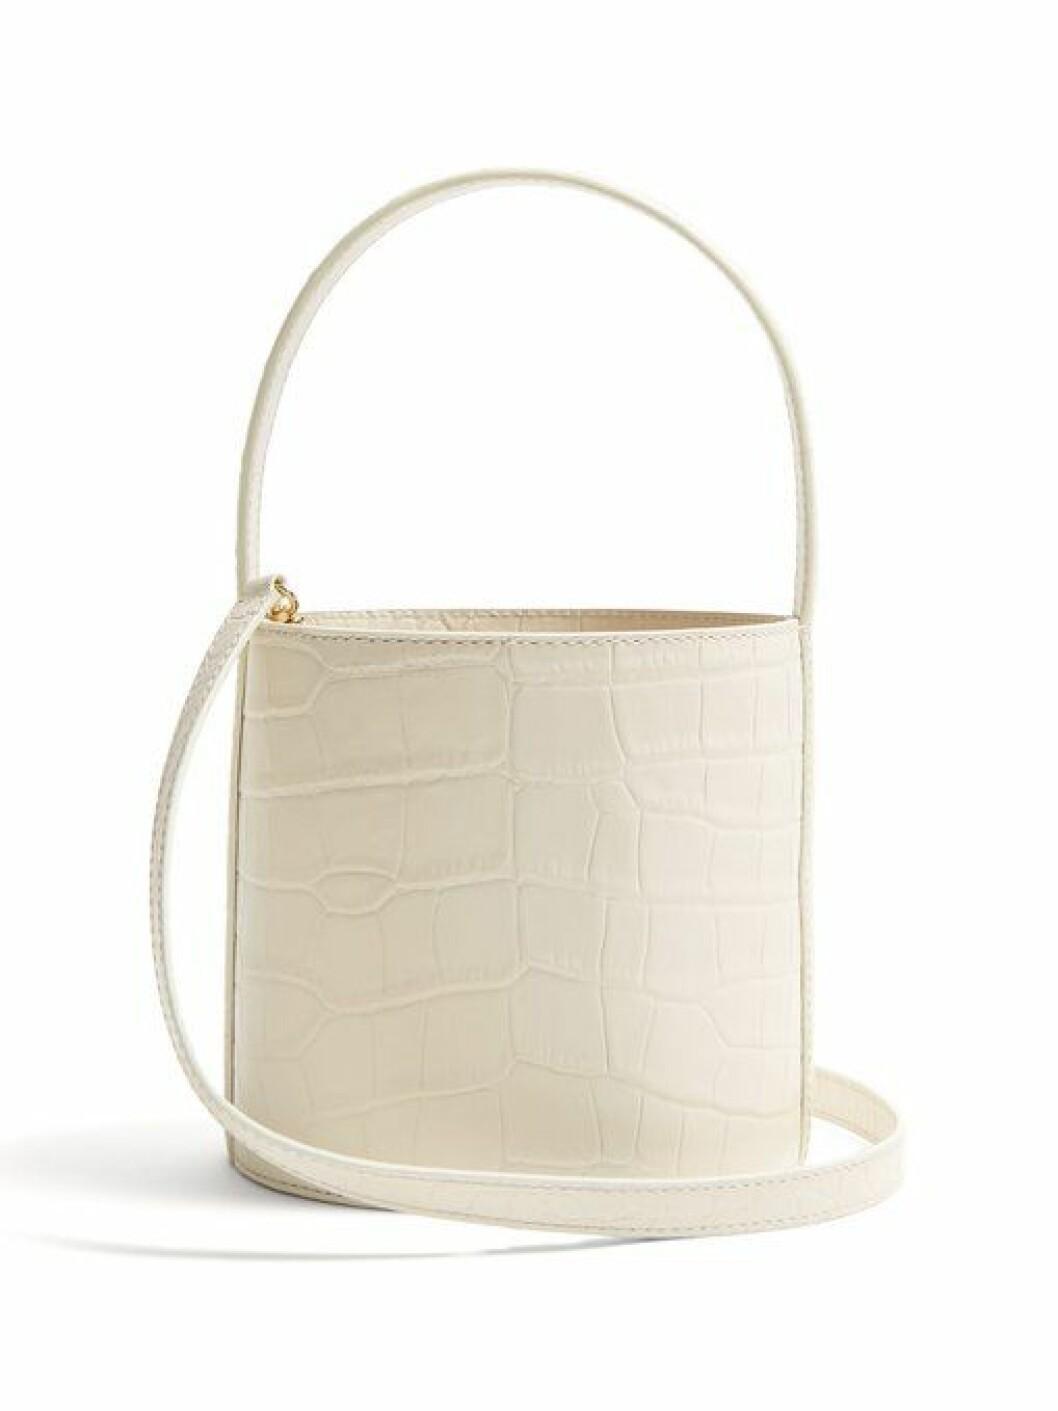 Bucket bag fra Staud |2815,-| https://www.matchesfashion.com/intl/products/Staud-Bissett-crocodile-effect-leather-bucket-bag-1250218